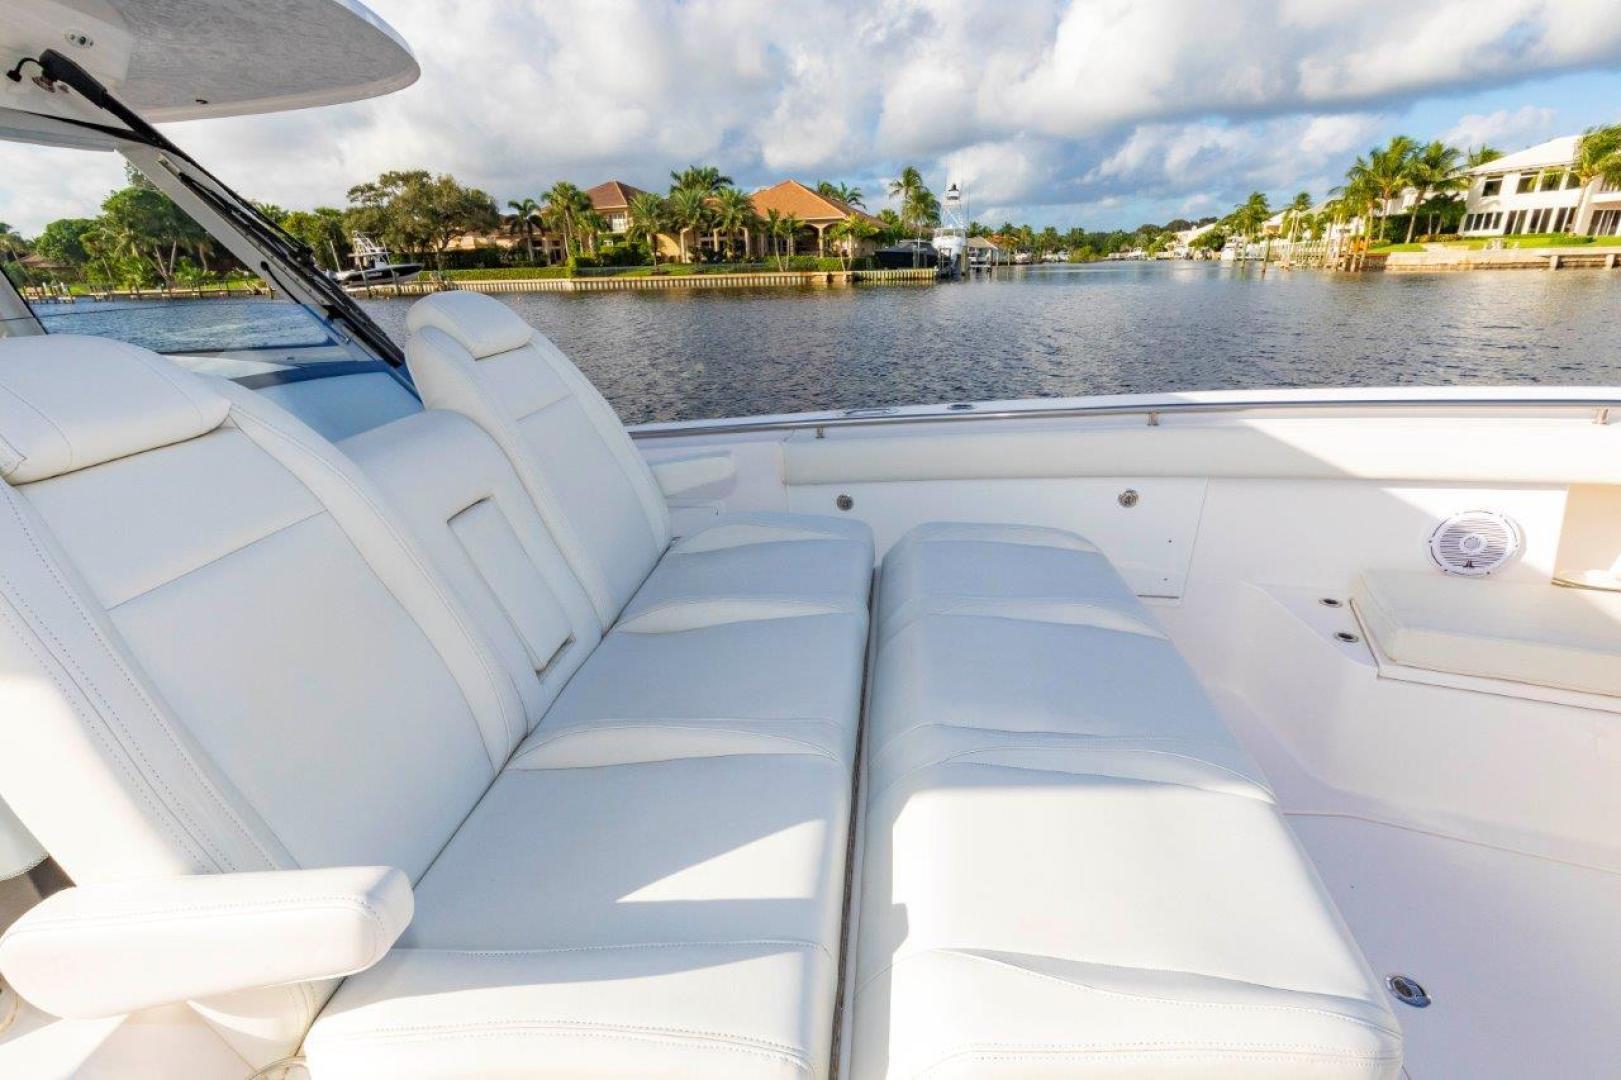 Everglades-435 Center Console 2019-Bahama Papa Palm Beach Gardens-Florida-United States-Forward Seating-1570500 | Thumbnail